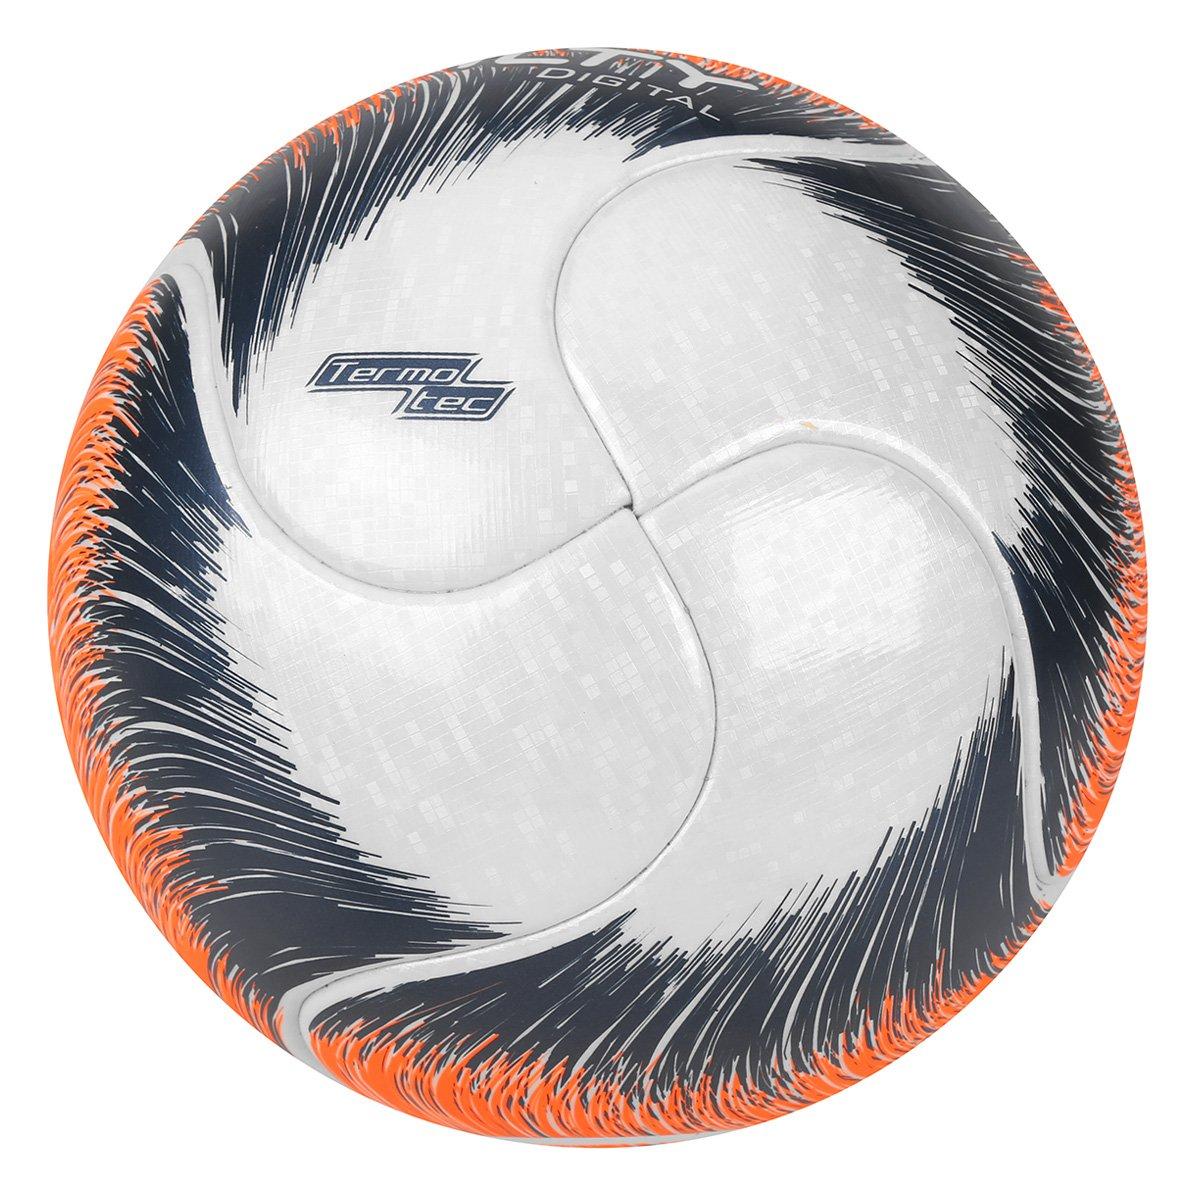 Bola Futsal Penalty Digital 500 Termotec VIII  747a8bec68012